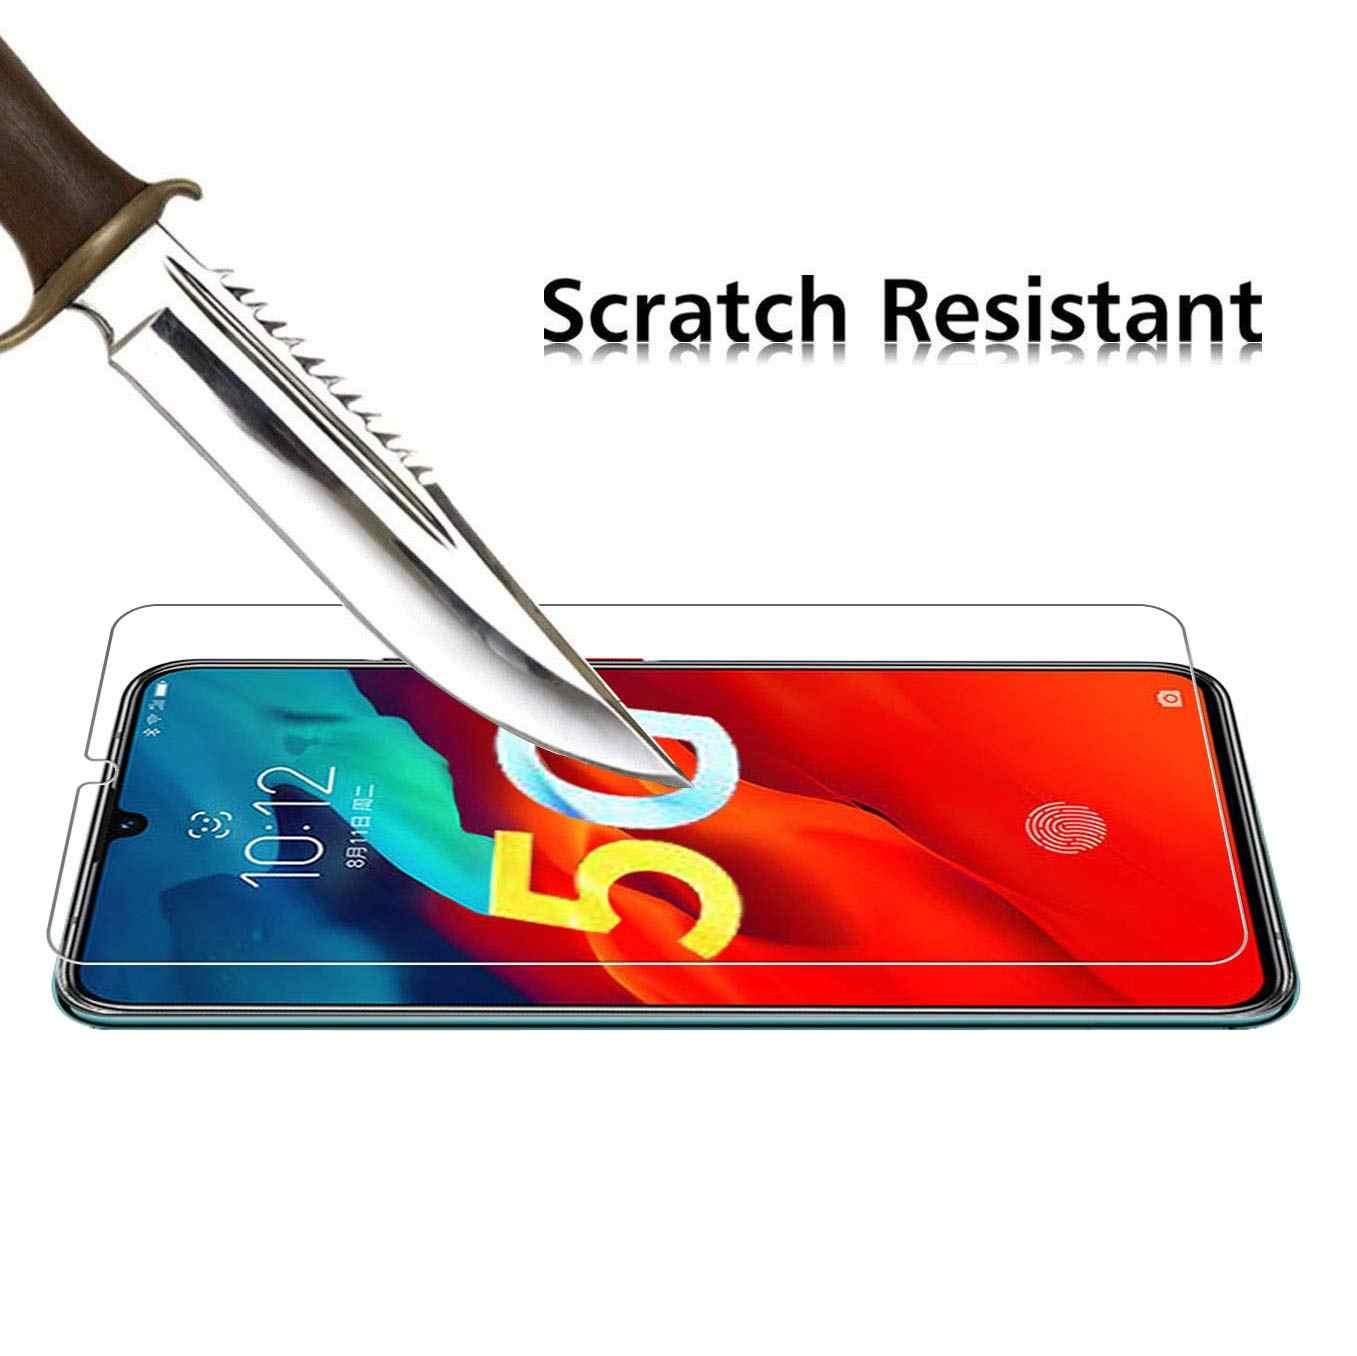 Стекло для Lenovo Z6 Lite/ Z6 Pro/ K6 Enjoy /K9 Note/Lenovo ZP закаленное стекло на Z6 Pro Защитное стекло для экрана телефона